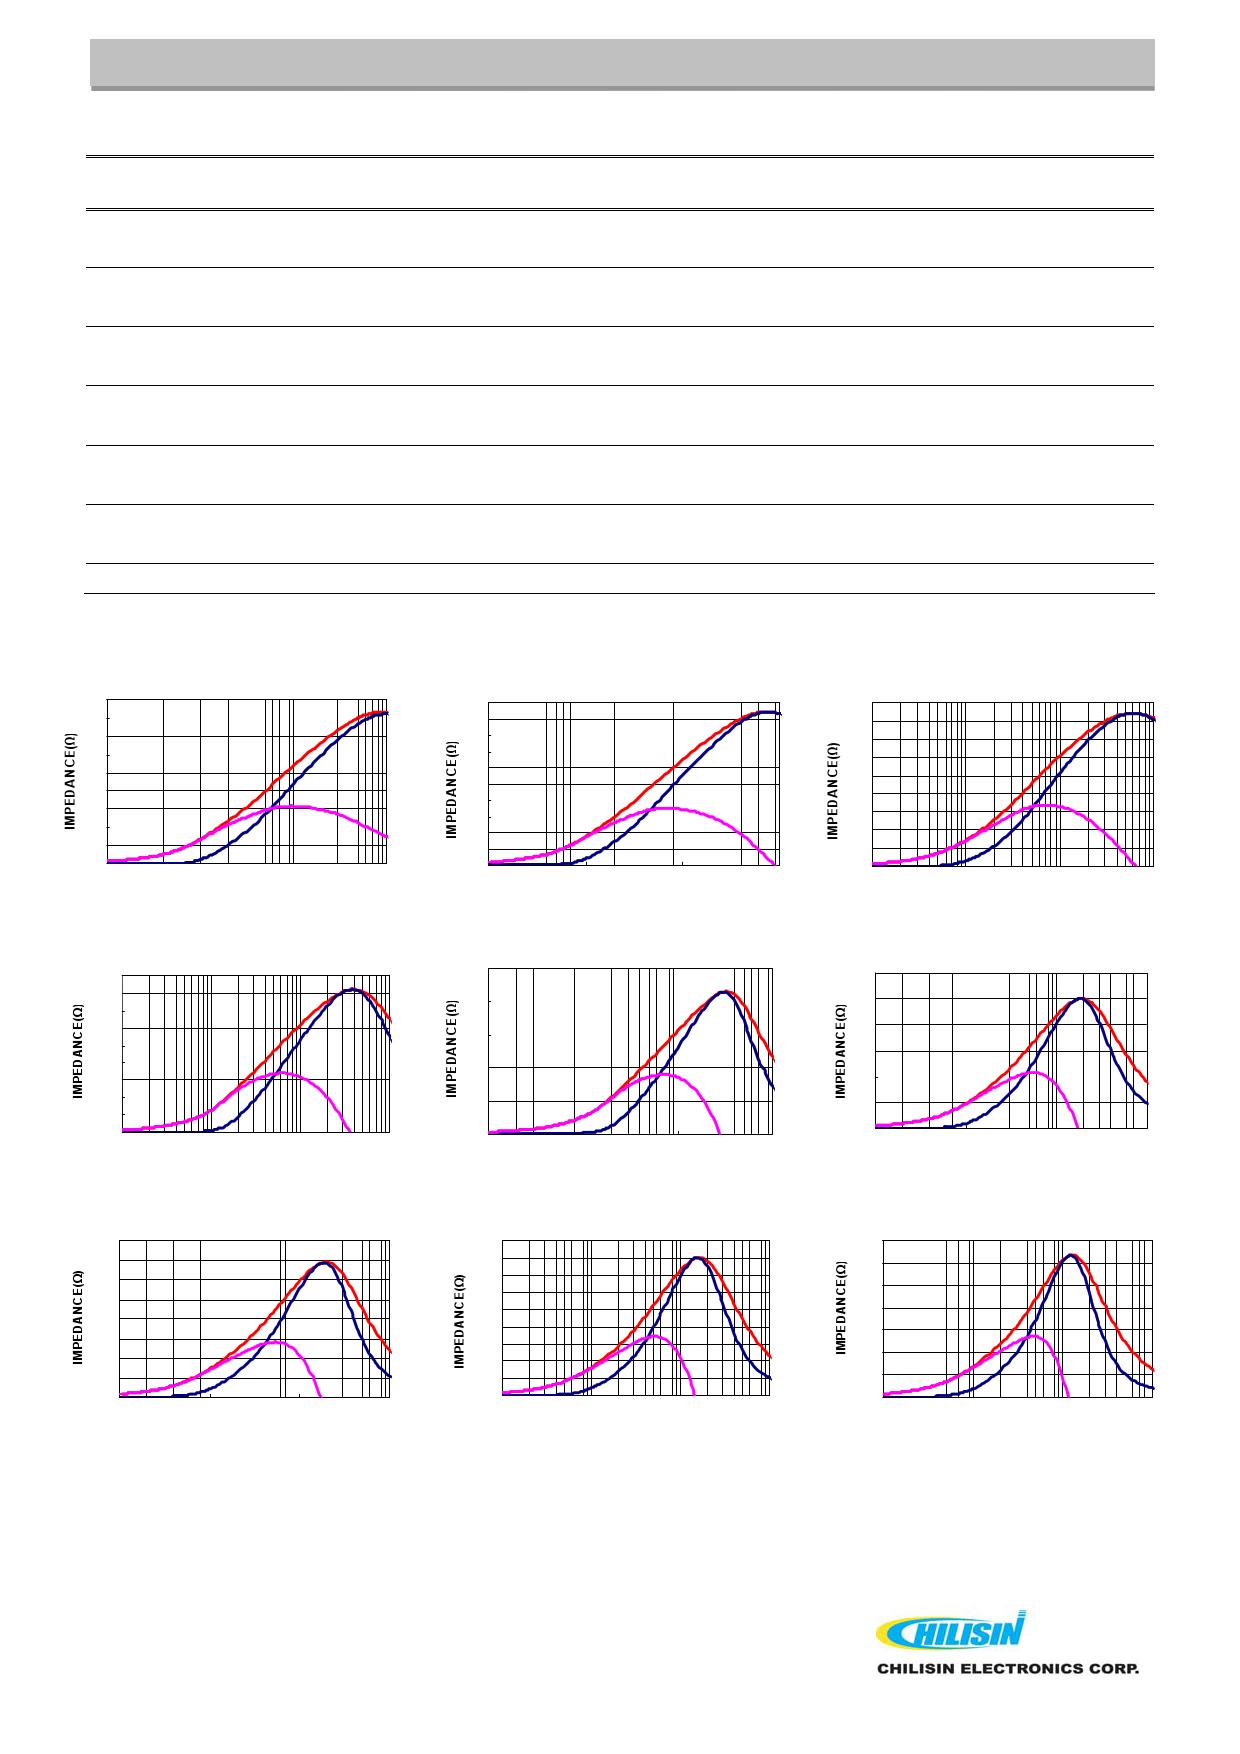 GBY201209T pdf, 반도체, 판매, 대치품